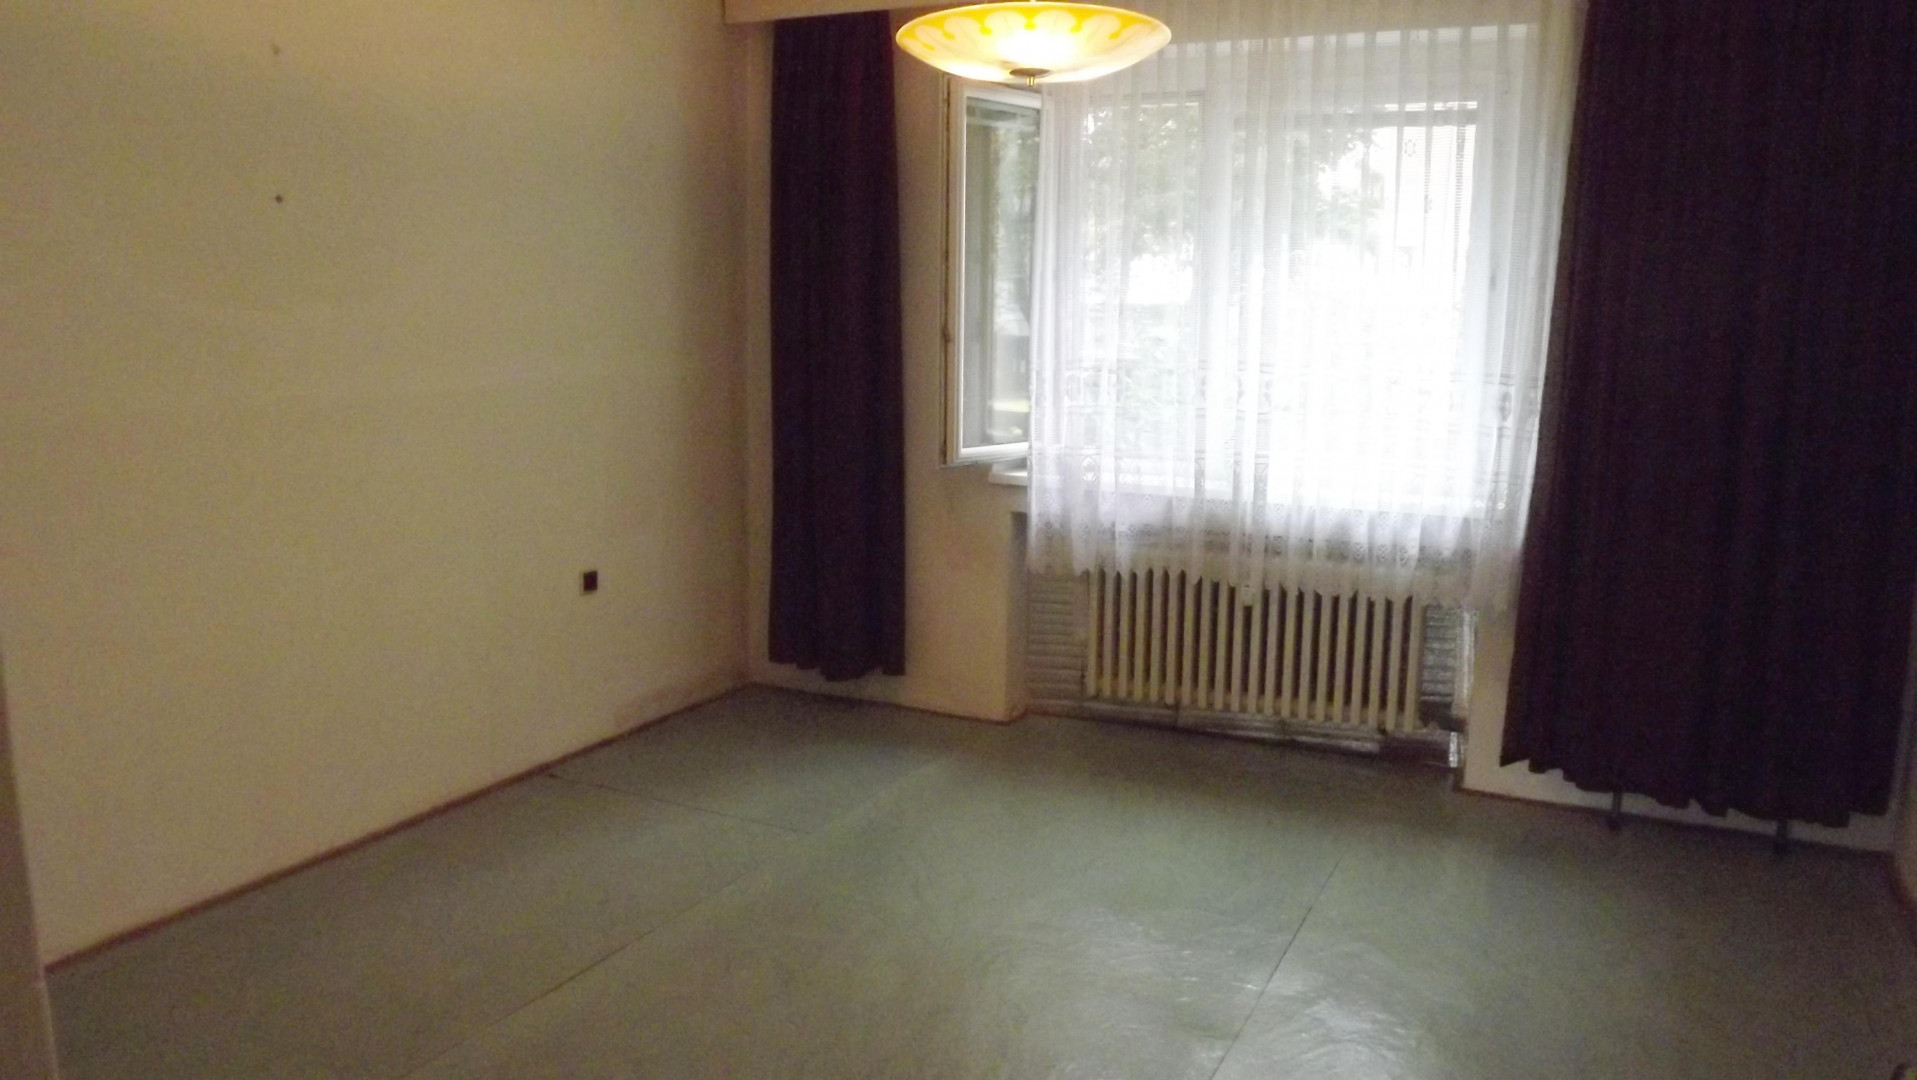 Byt, 3 - izbový, 81m2, Bratislava III - Nové mesto, Tylová ulica